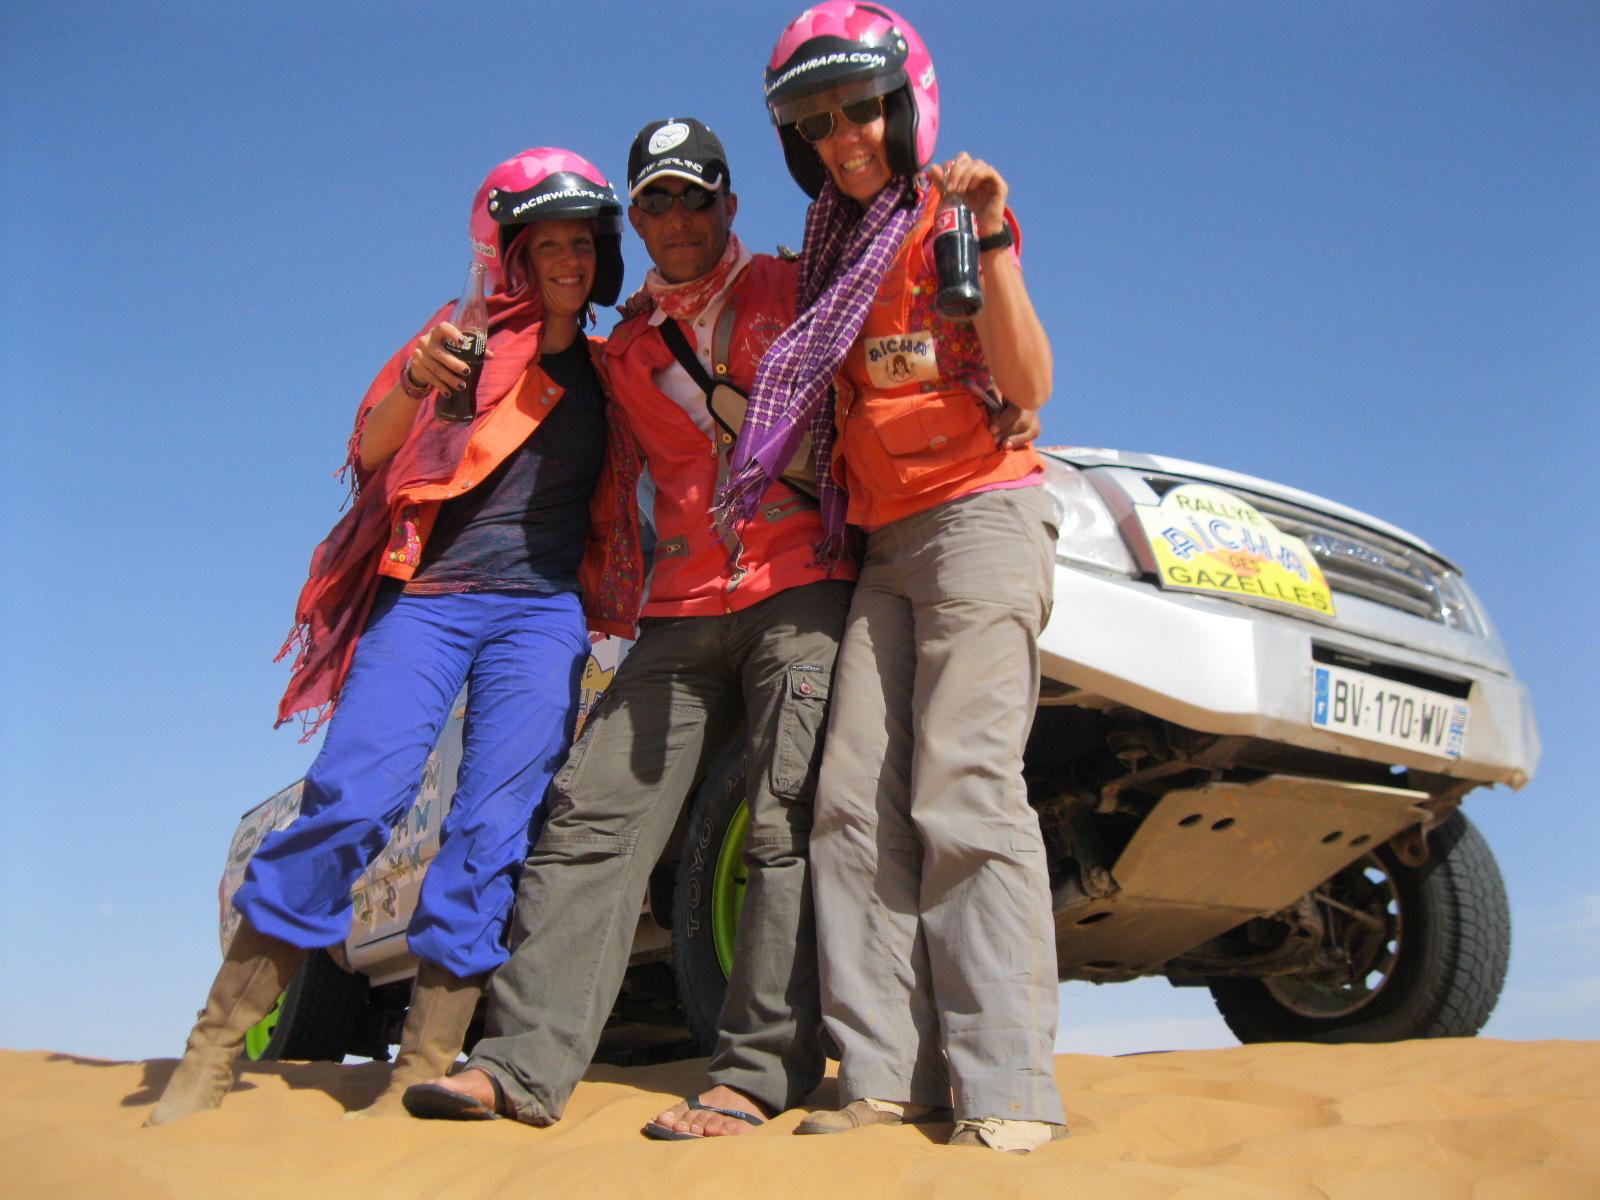 Team Camion Papillon